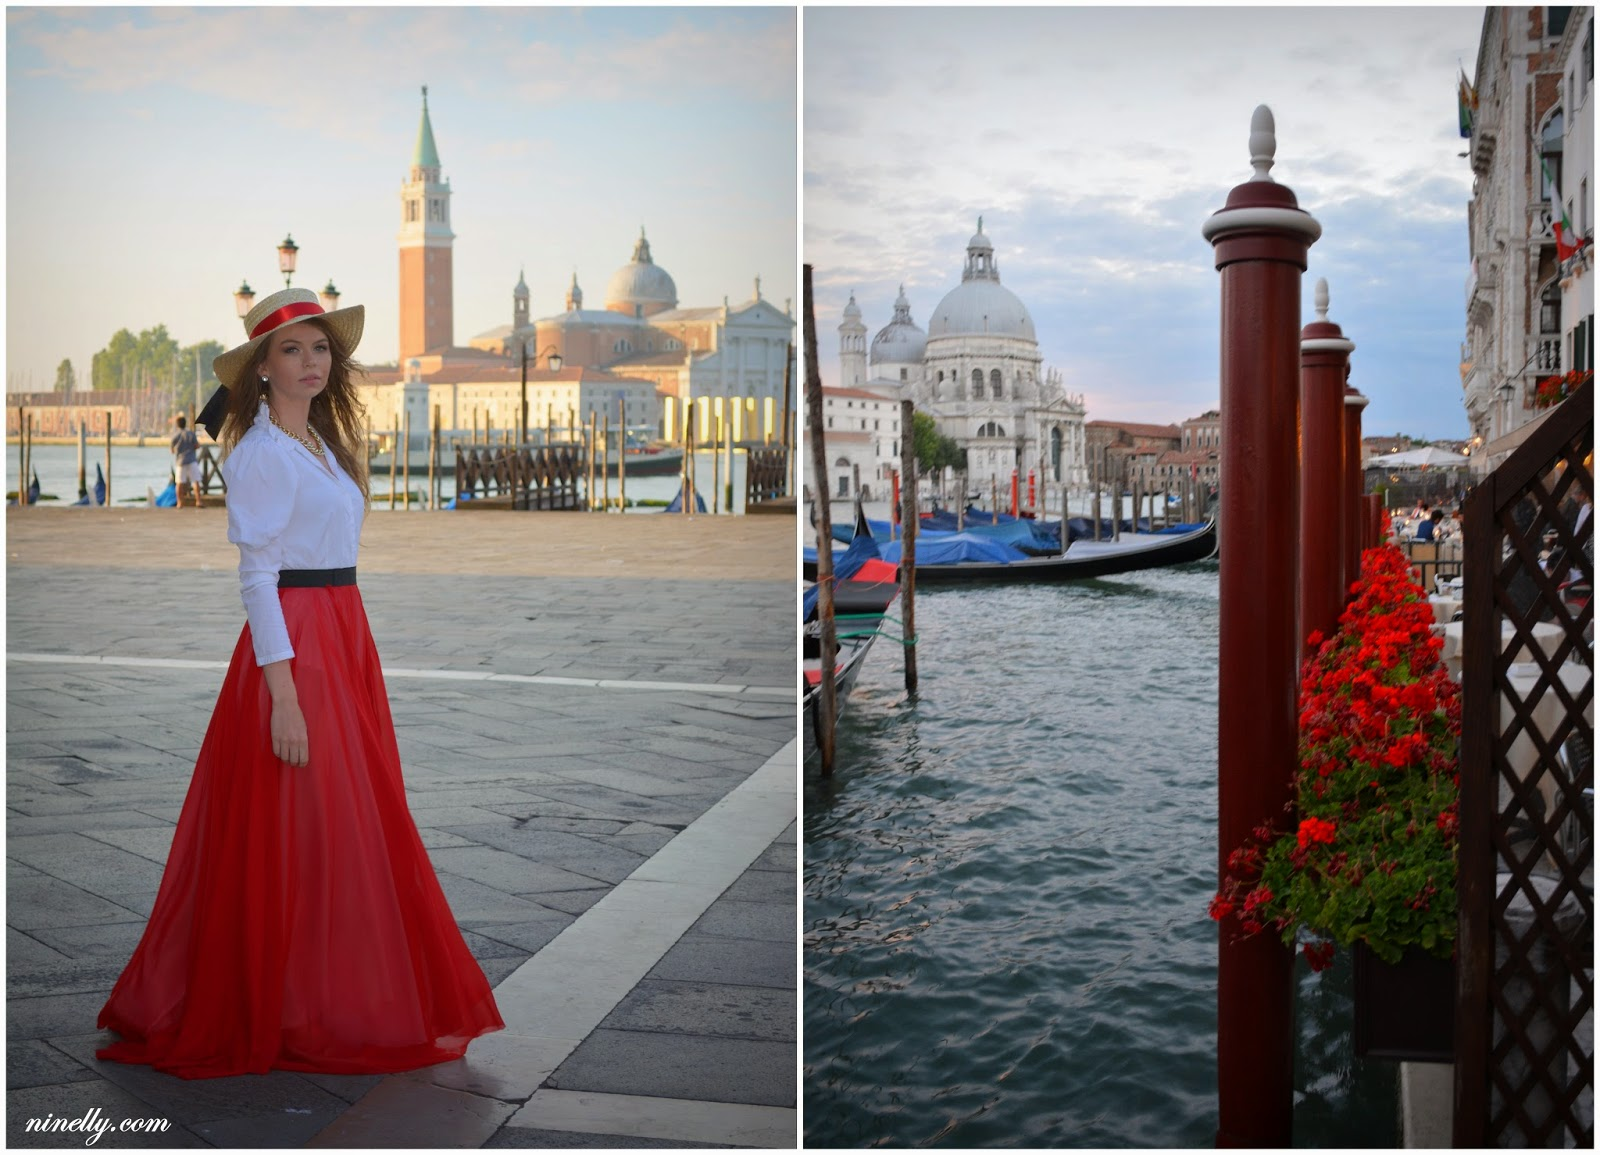 блог о италии стиле и путешествиях